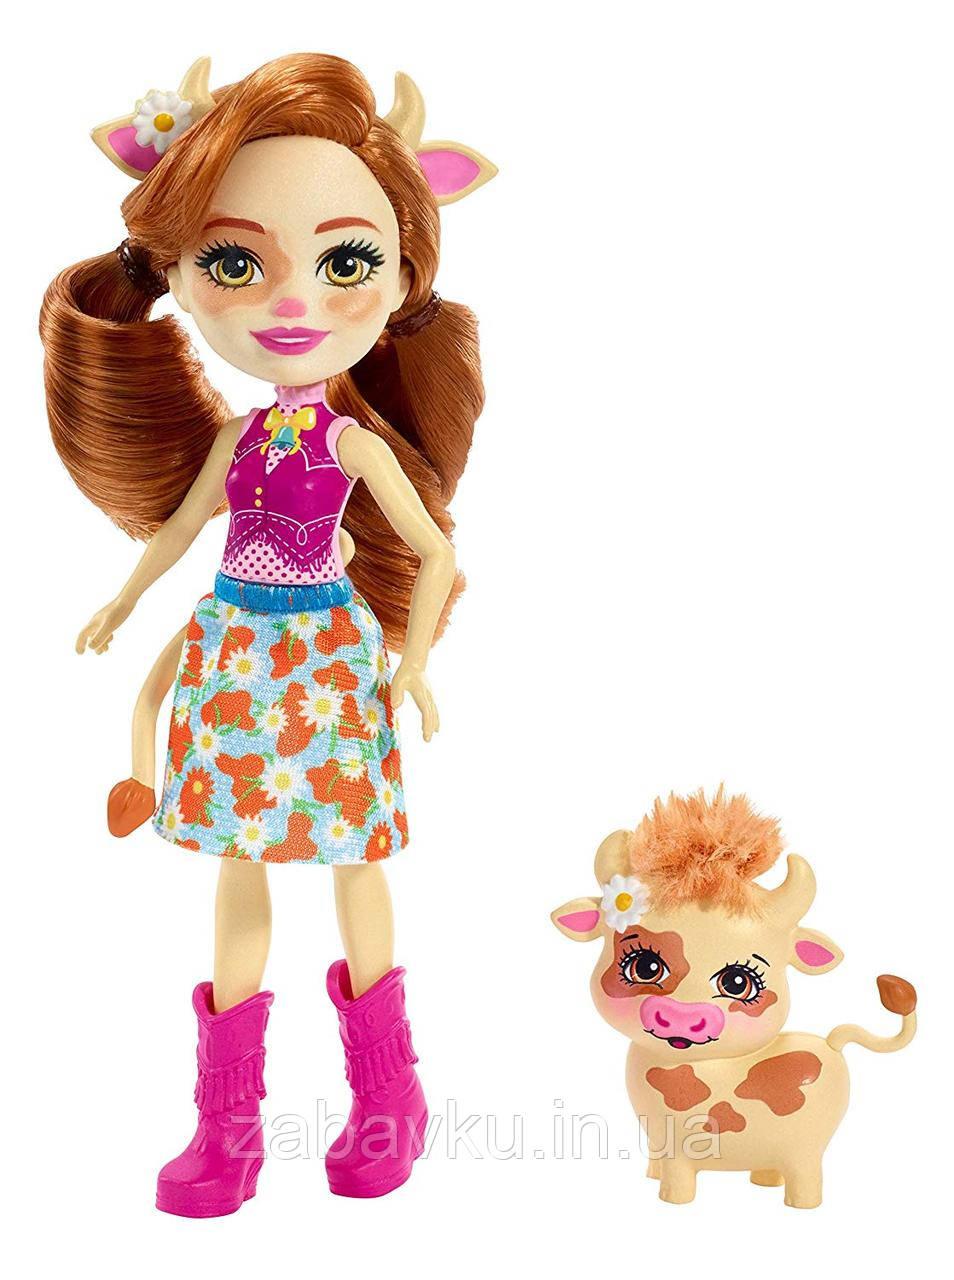 Enchantimals Cailey Cow Doll & Curdle Figure Лялька енчантімалс коровка Кай